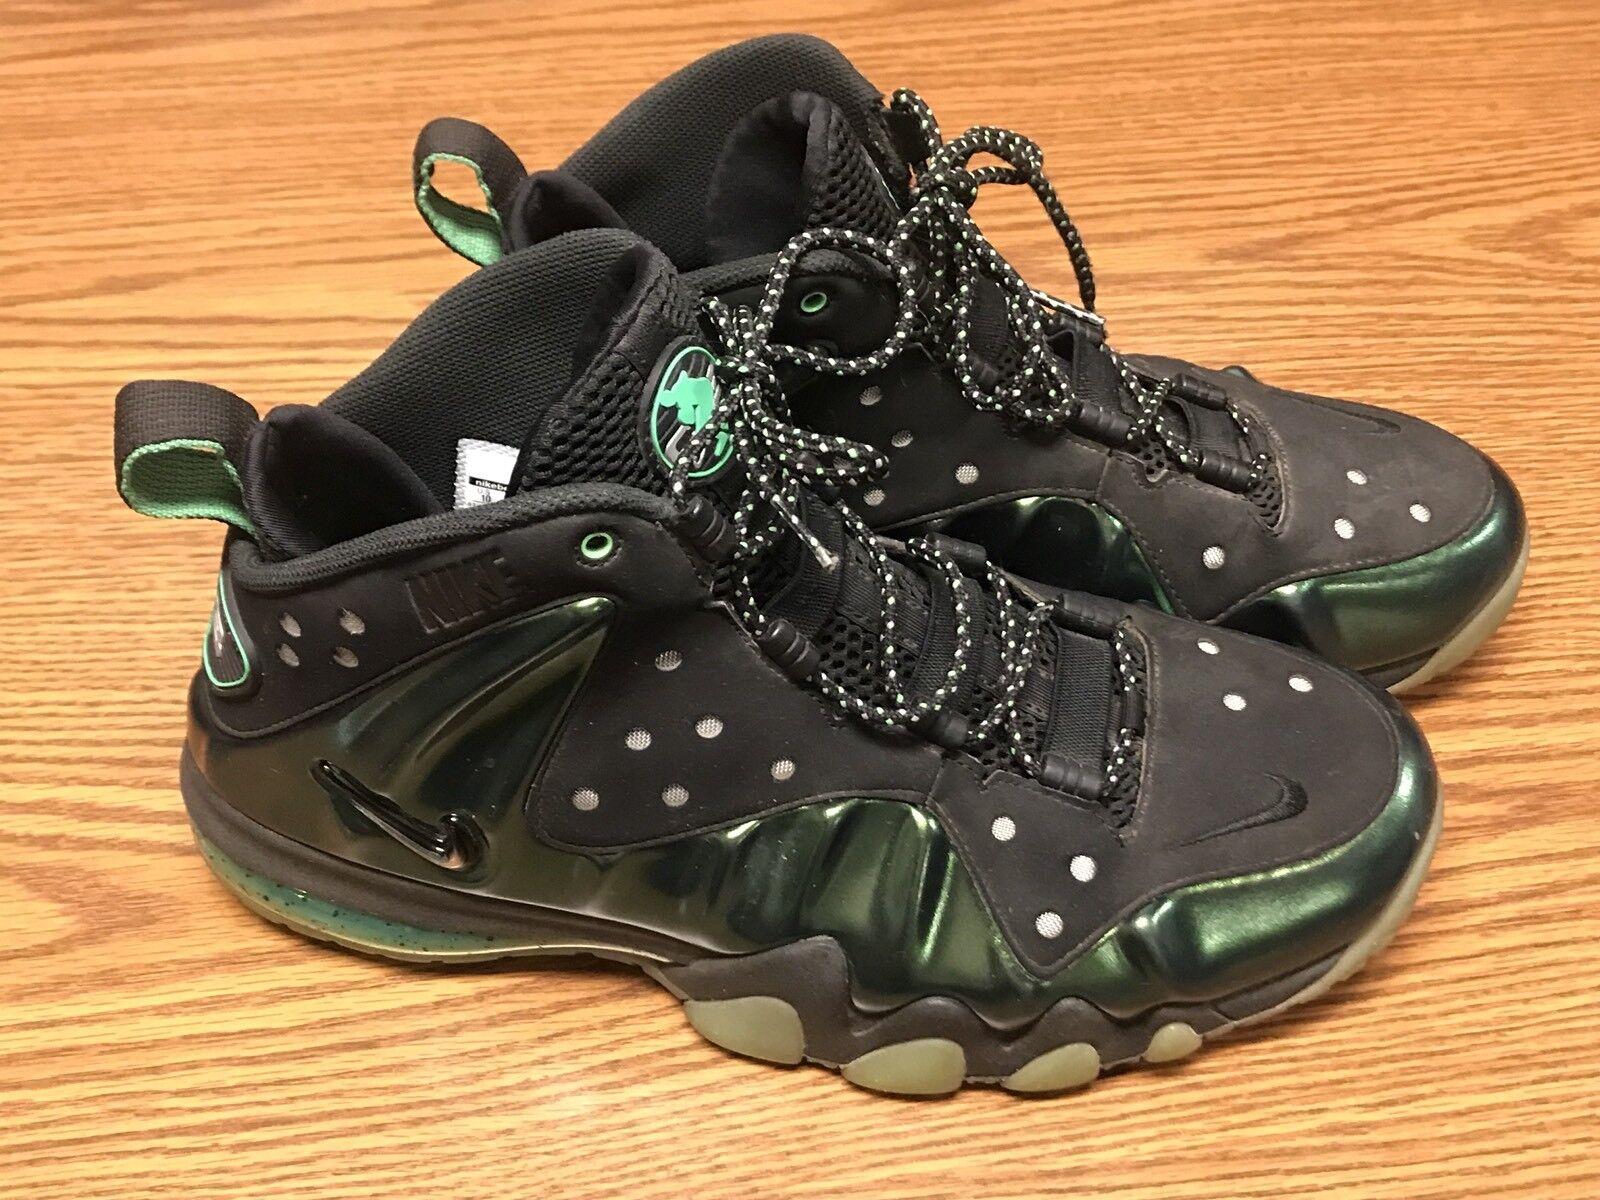 Nike air max 555097-301 barkley posite gamma verde nero scarpe da uomo sz 10